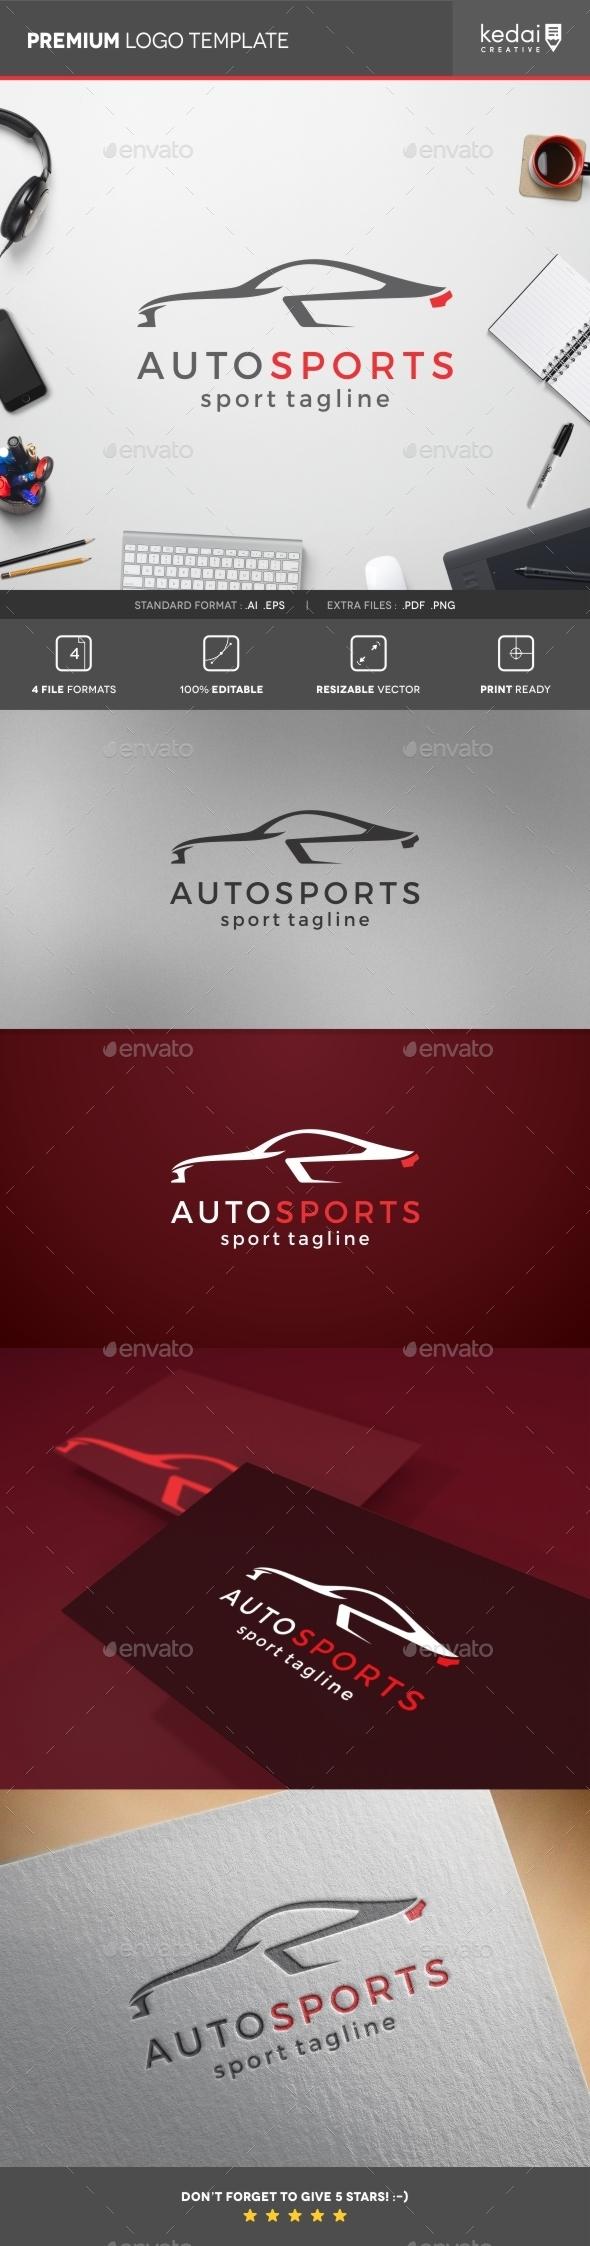 GraphicRiver Autosports 10407945